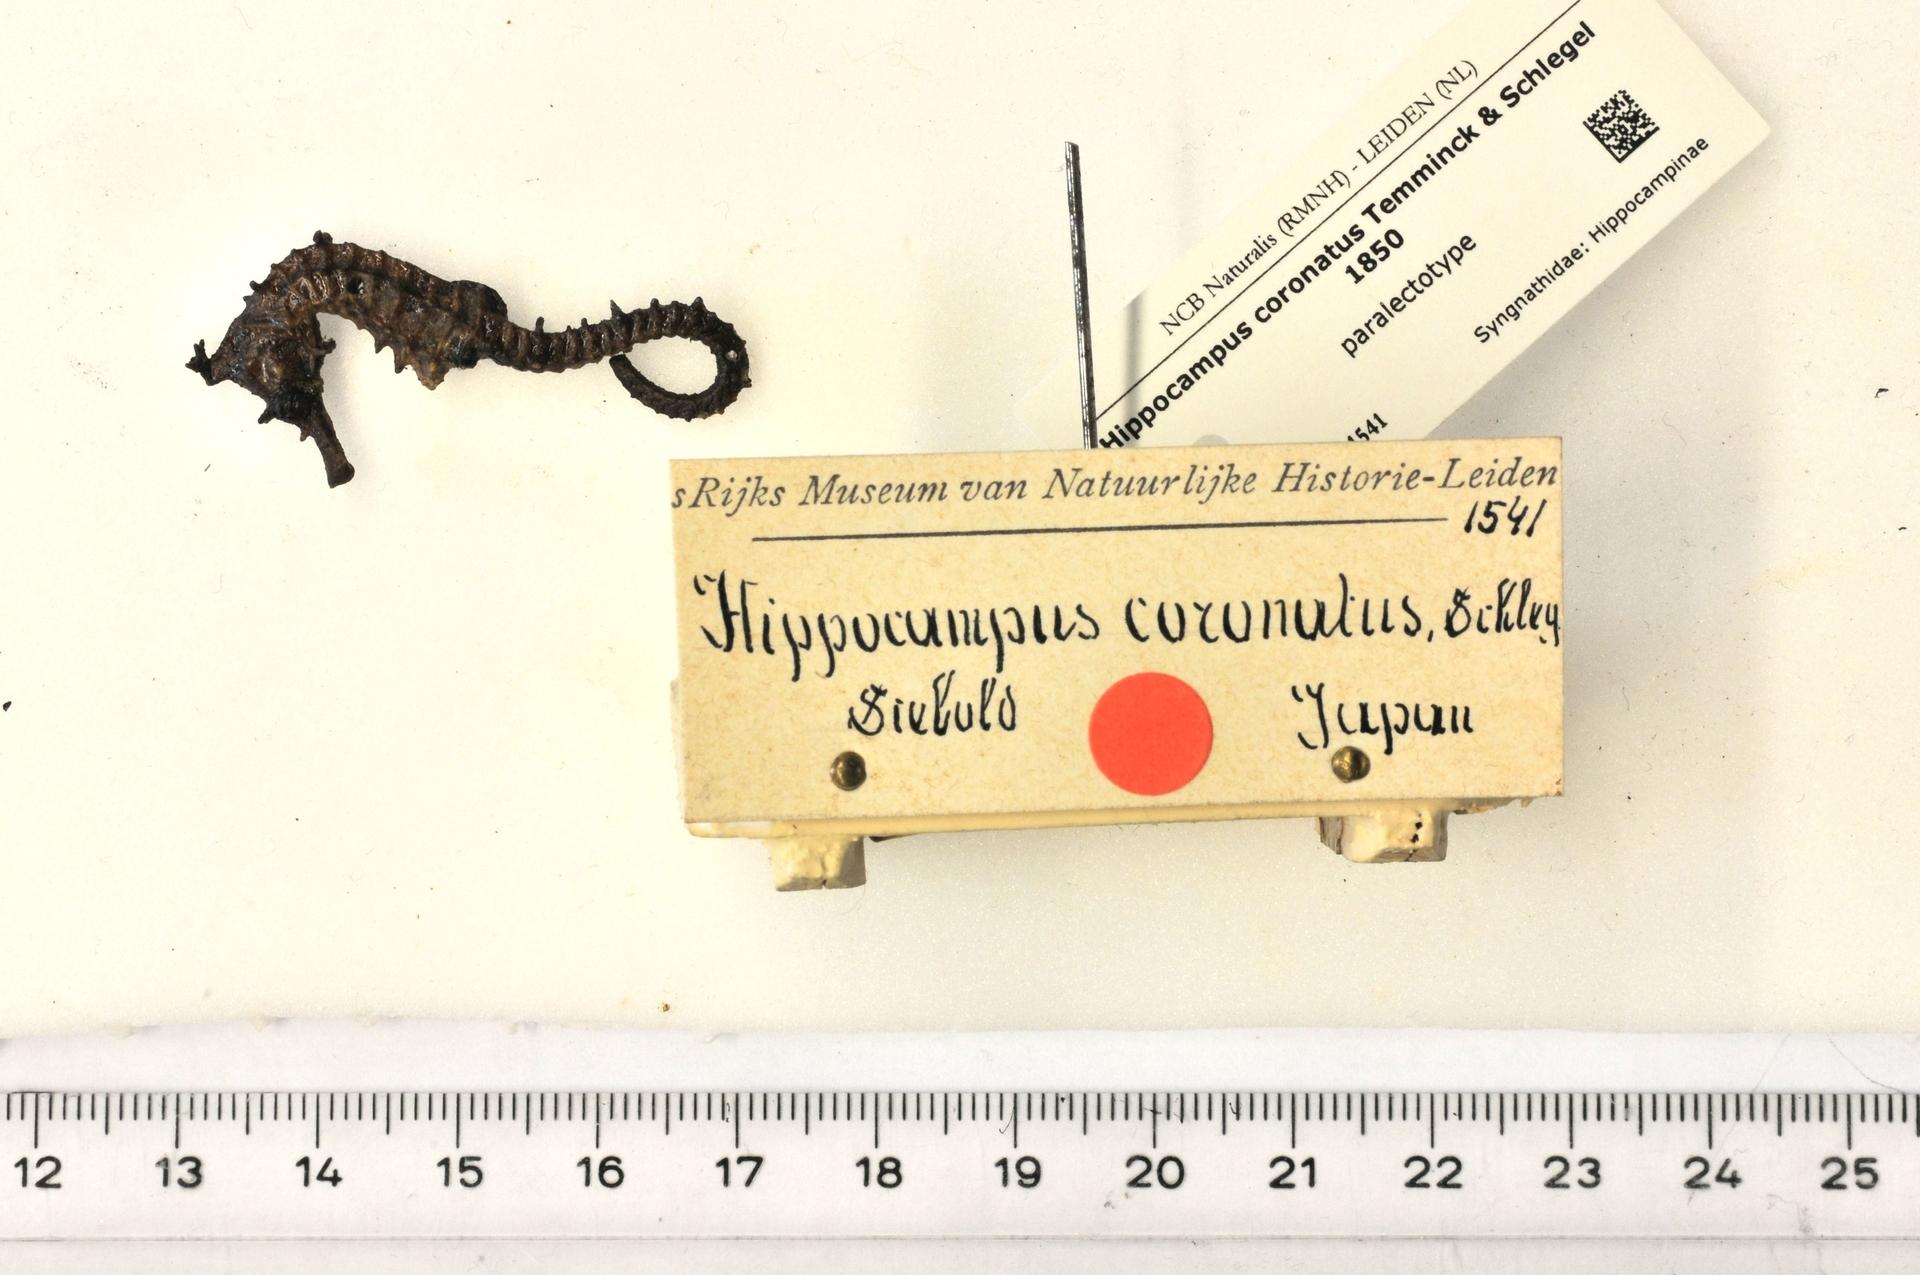 RMNH.PISC.D.1541 | Hippocampus coronatus Temminck & Schlegel 1850